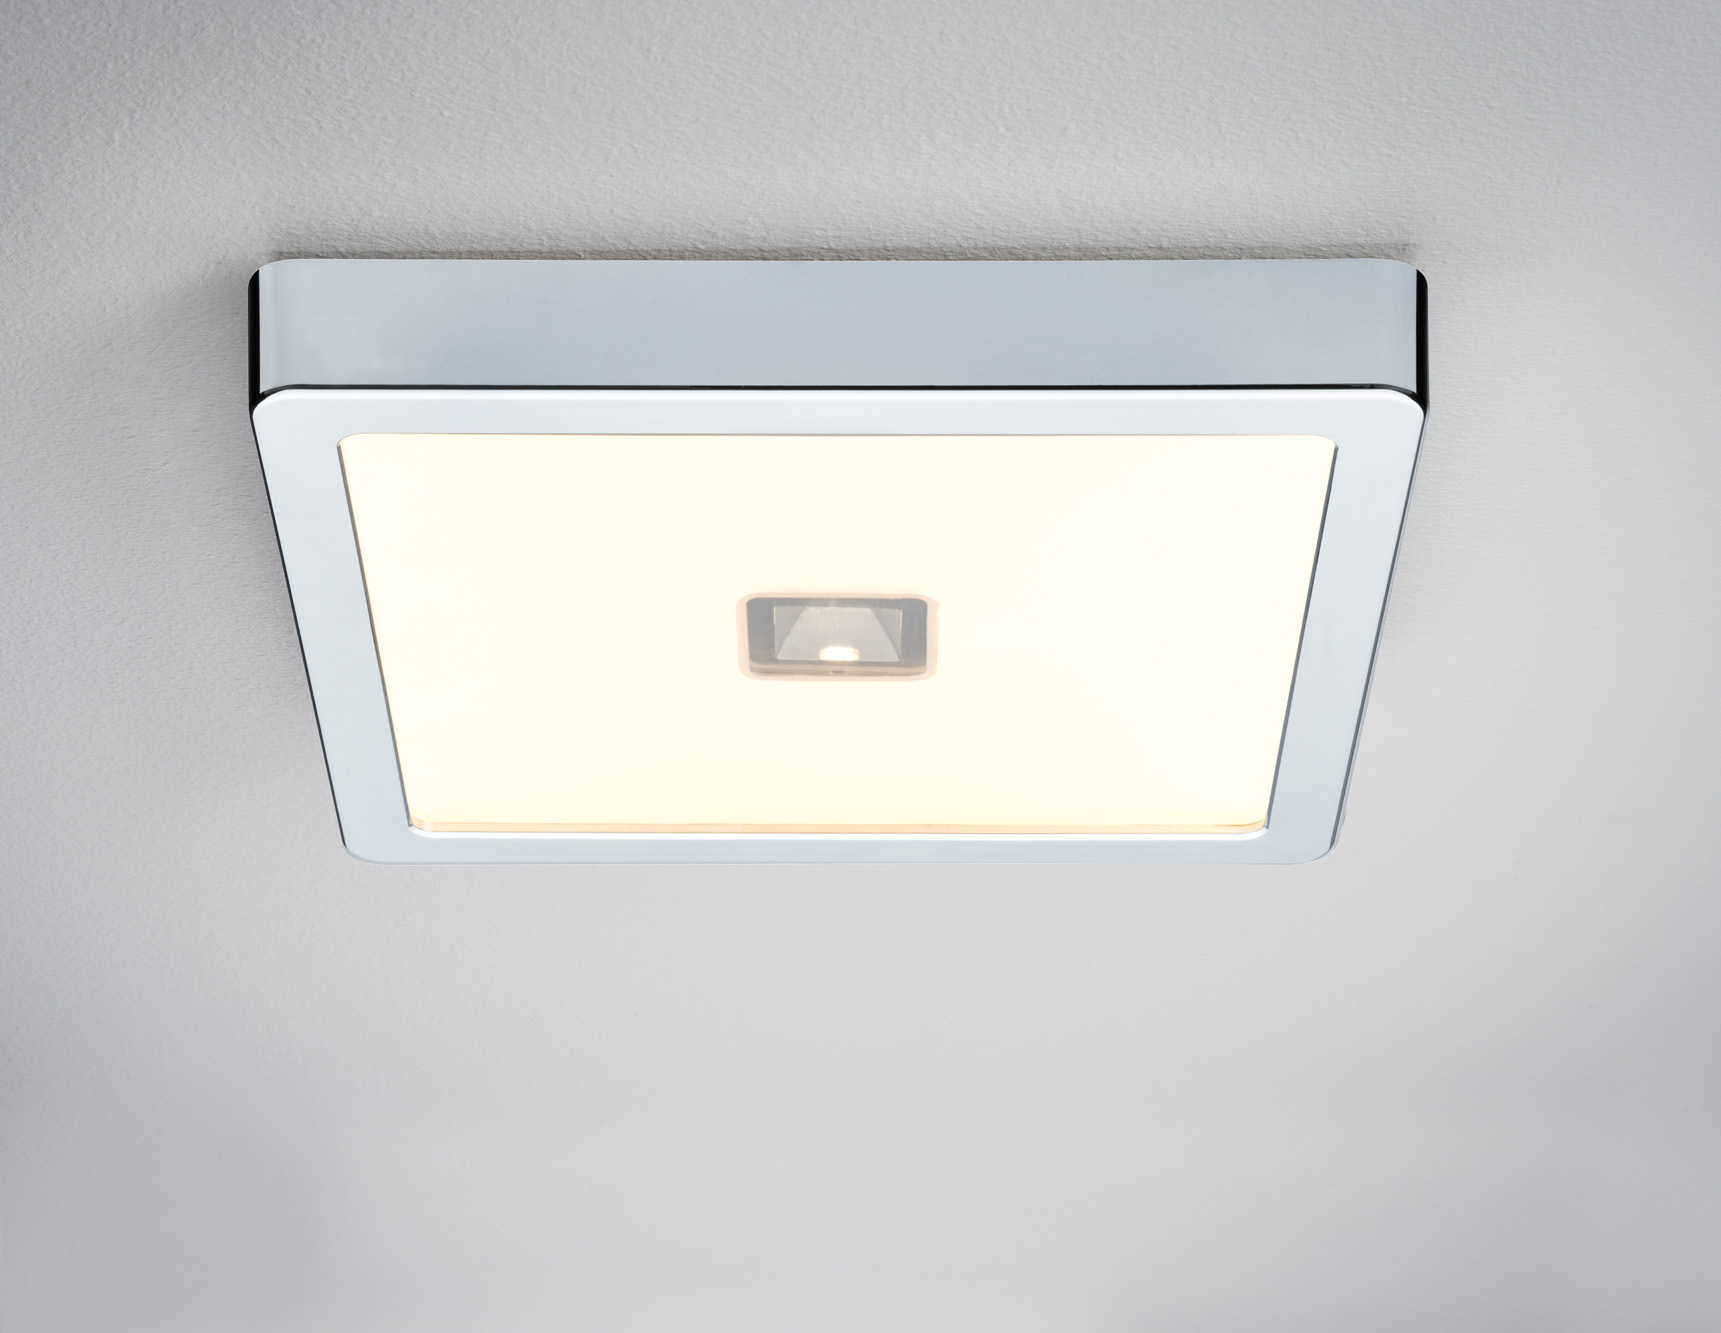 Aufbaupanel LED Beam Eckig 13,5W Chrom IP44 70691